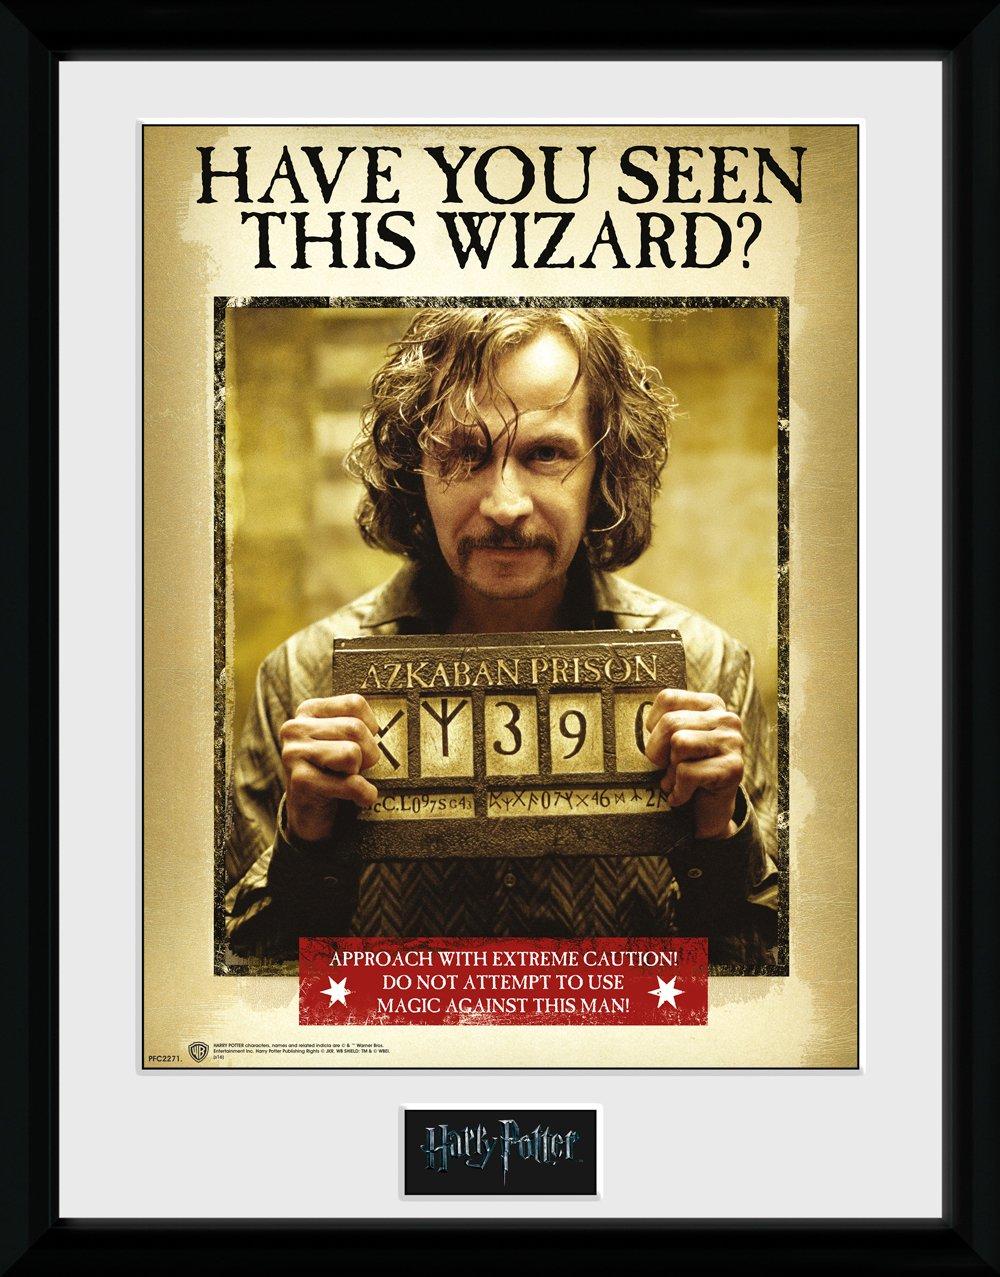 Harry potter azkaban full movie 123 | Harry Potter and the Goblet of